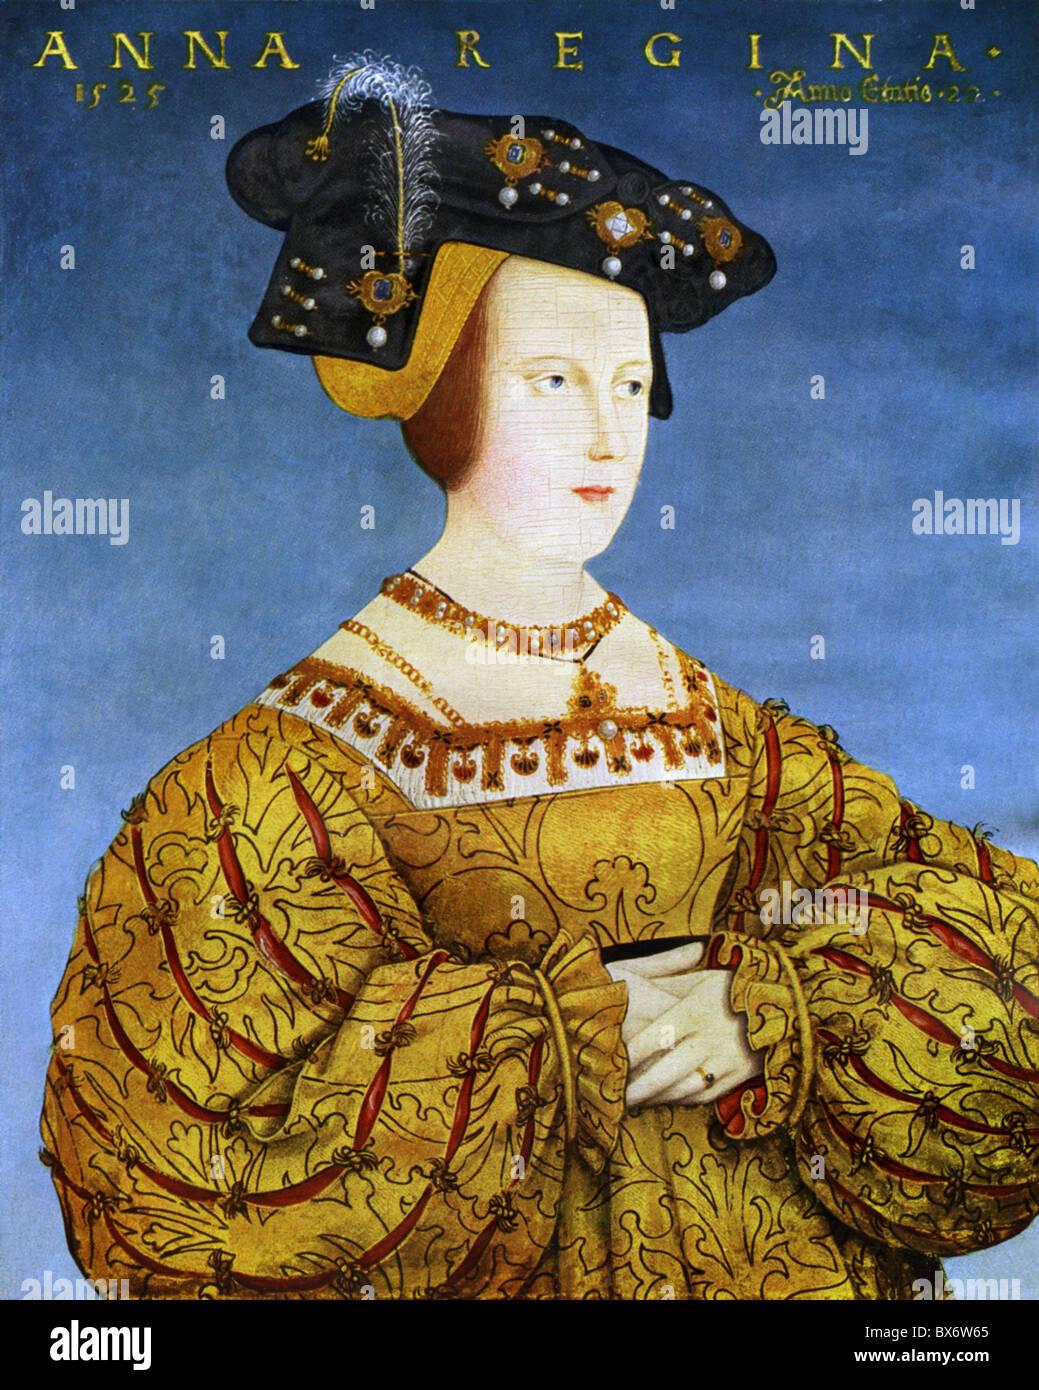 Anna, 23.7.1503 - 27.1.1547, Rainha dos romanos 5.1.1531 - 27.1.1547, retrato, imprimir após a pintura de Hans Imagens de Stock